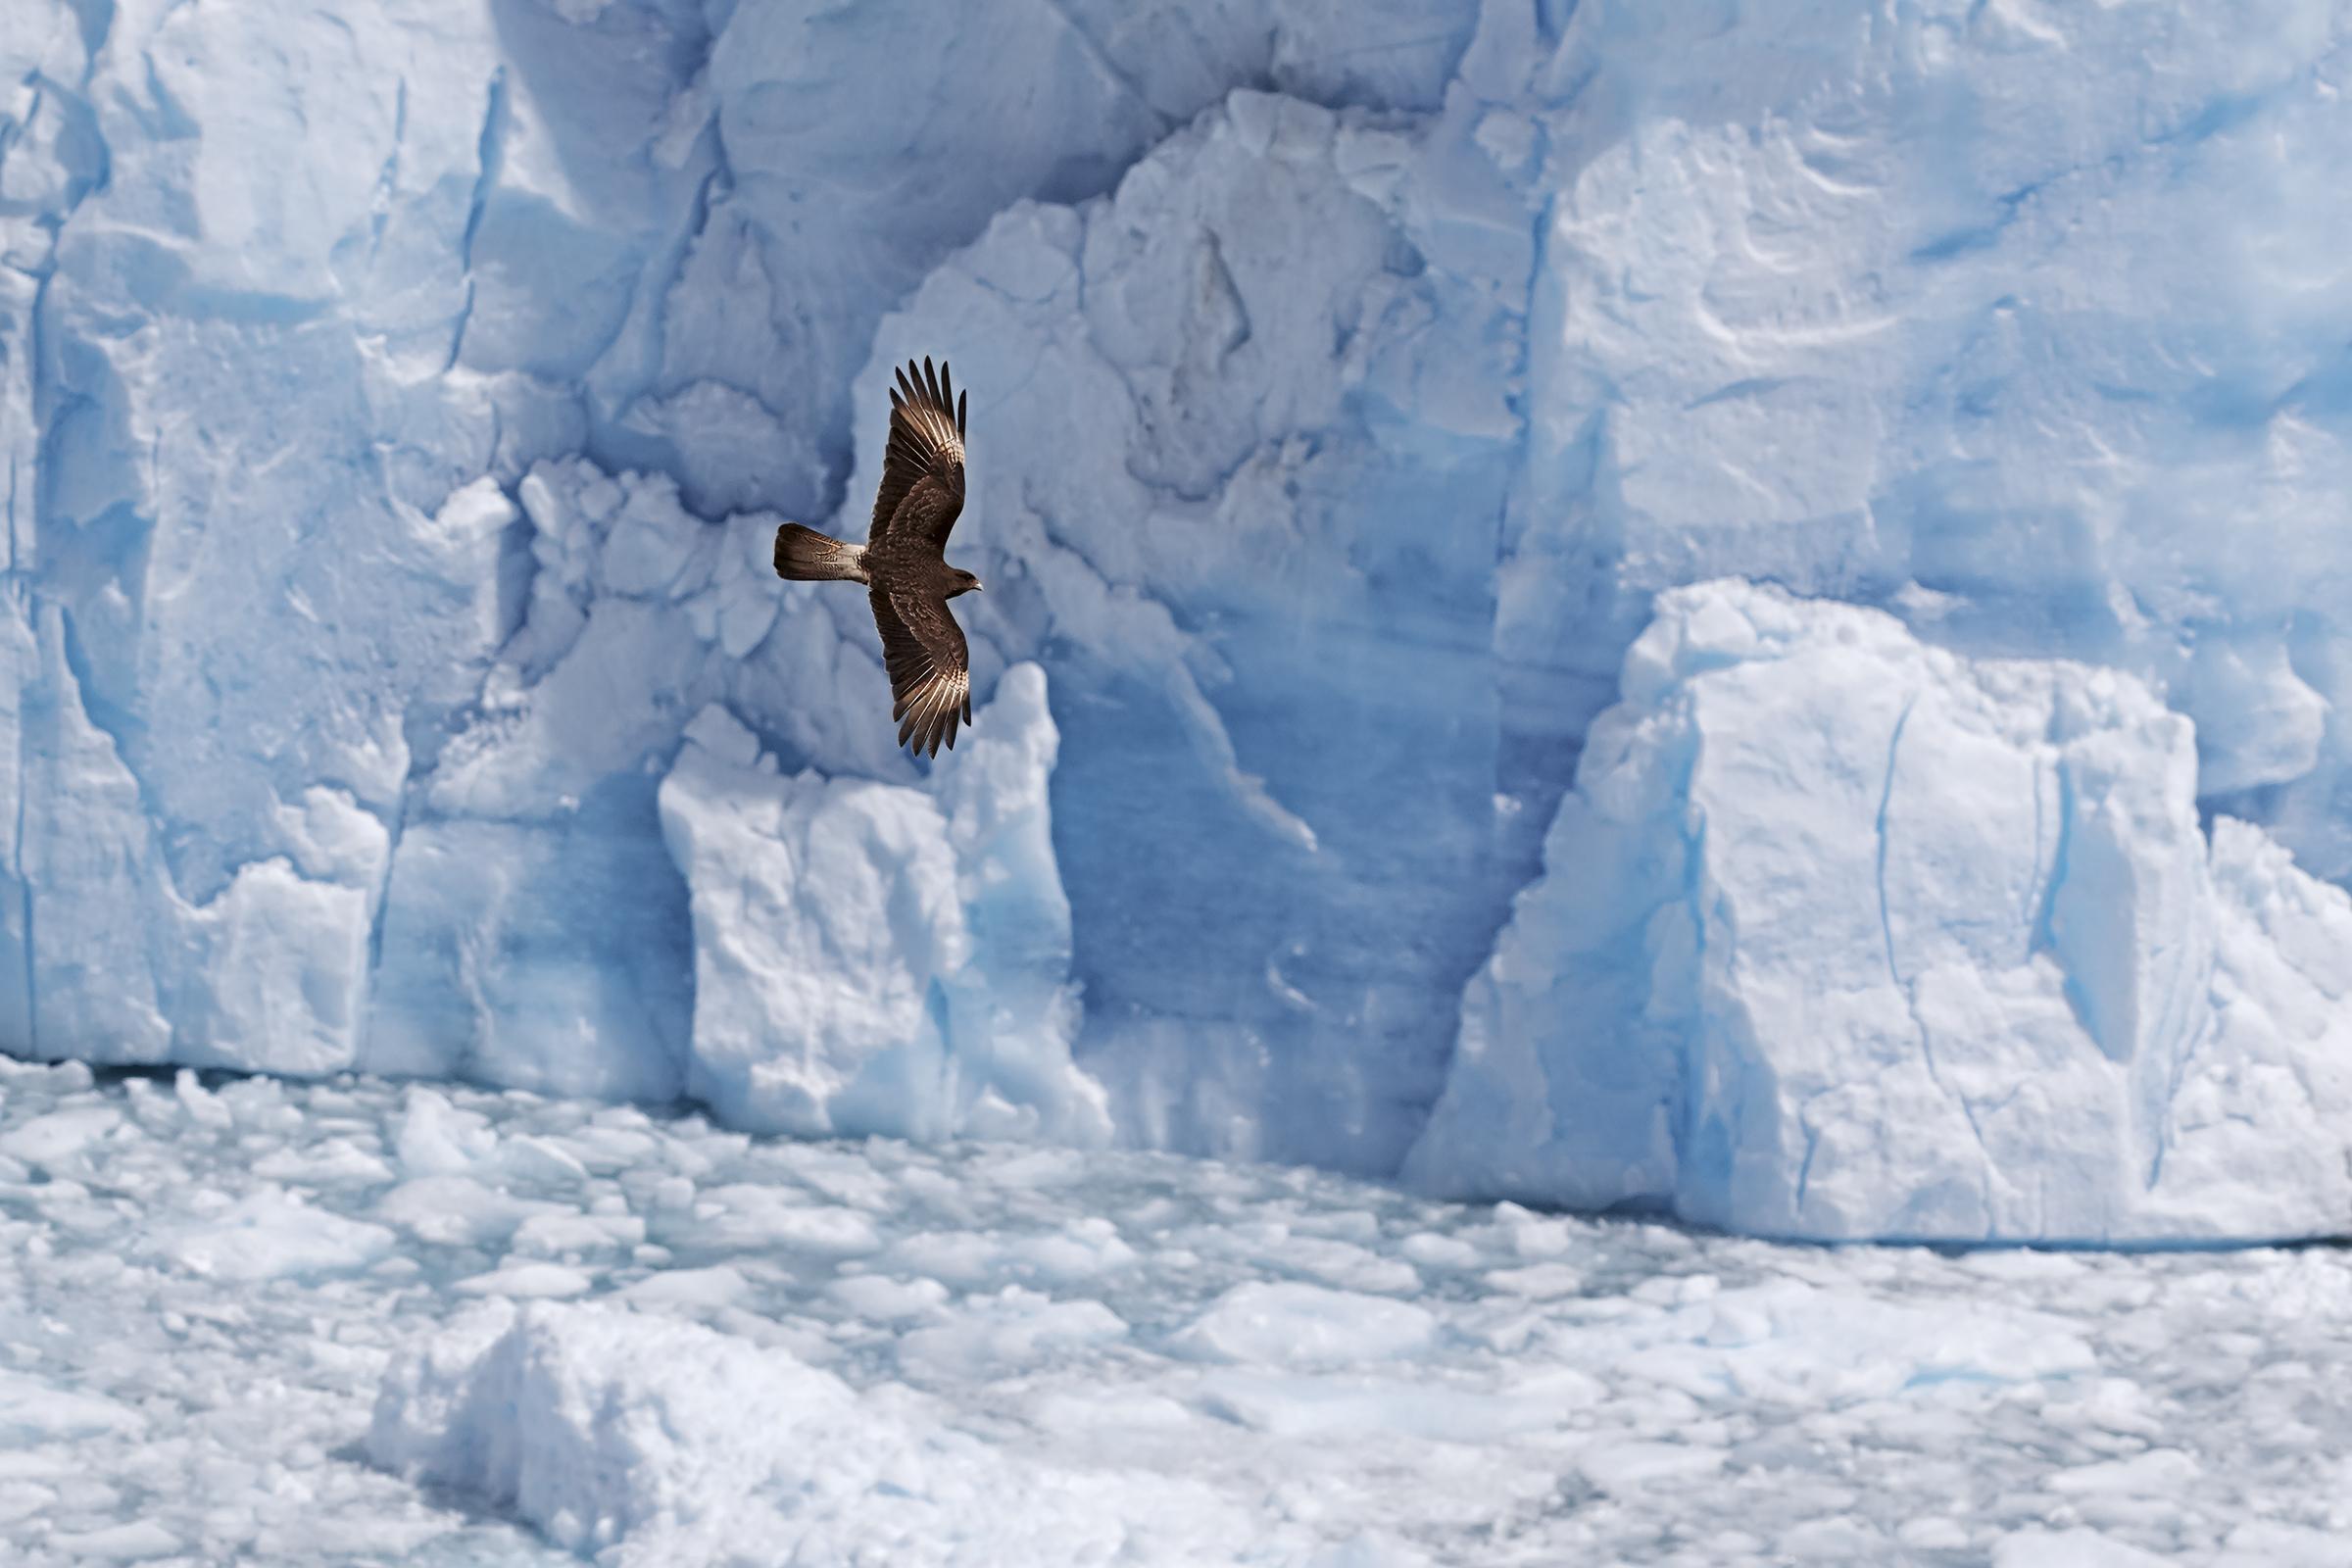 Flying over the glacier...